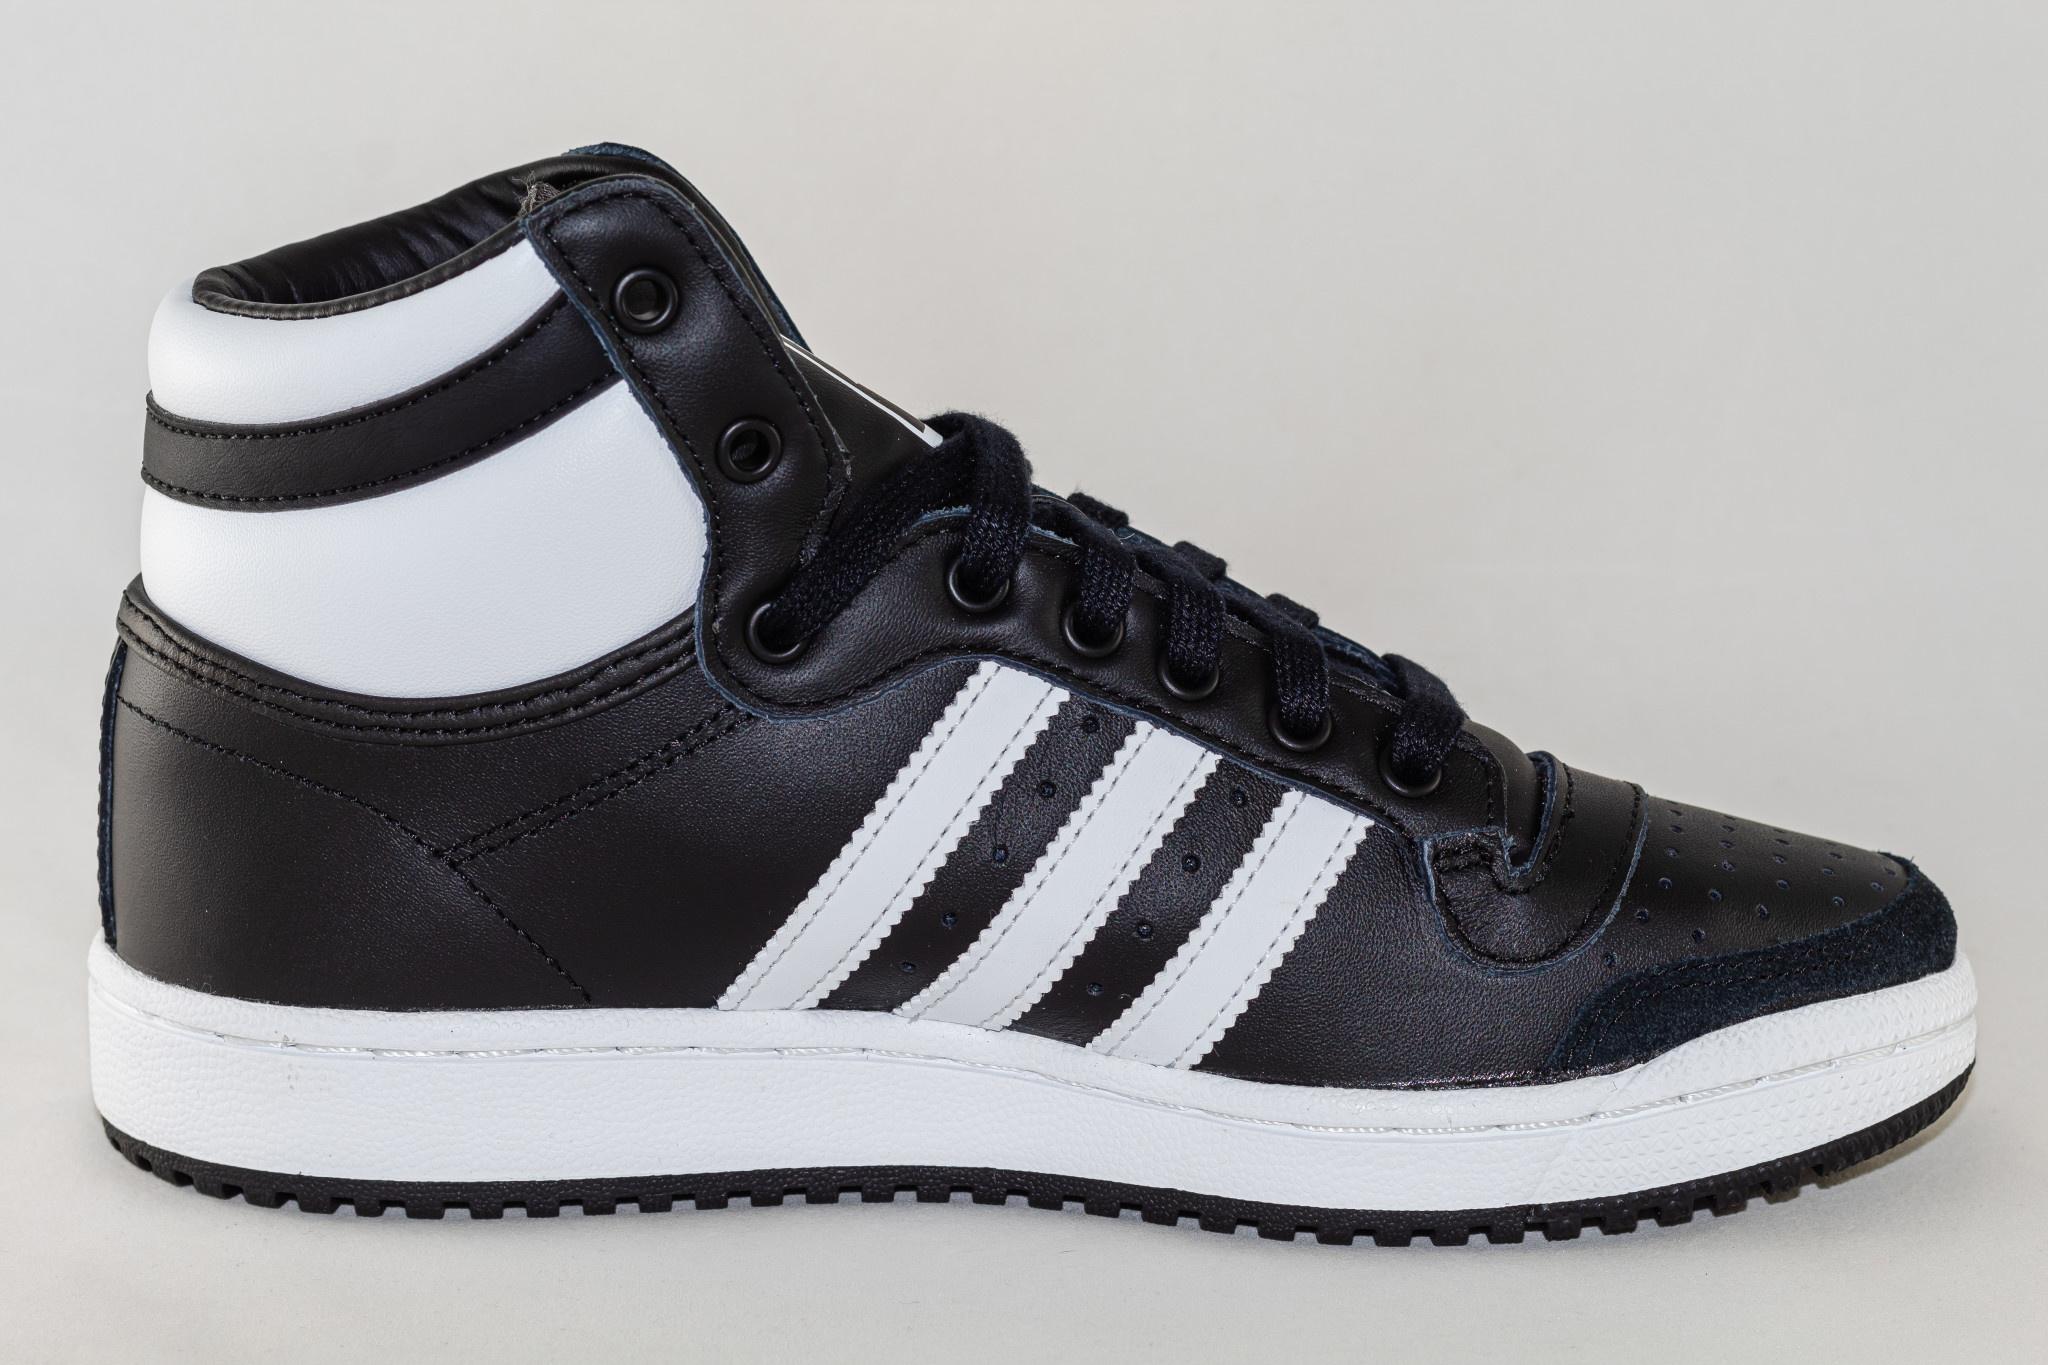 Adidas TOP TEN HI Cblack/ Ftwwht/ Cblack